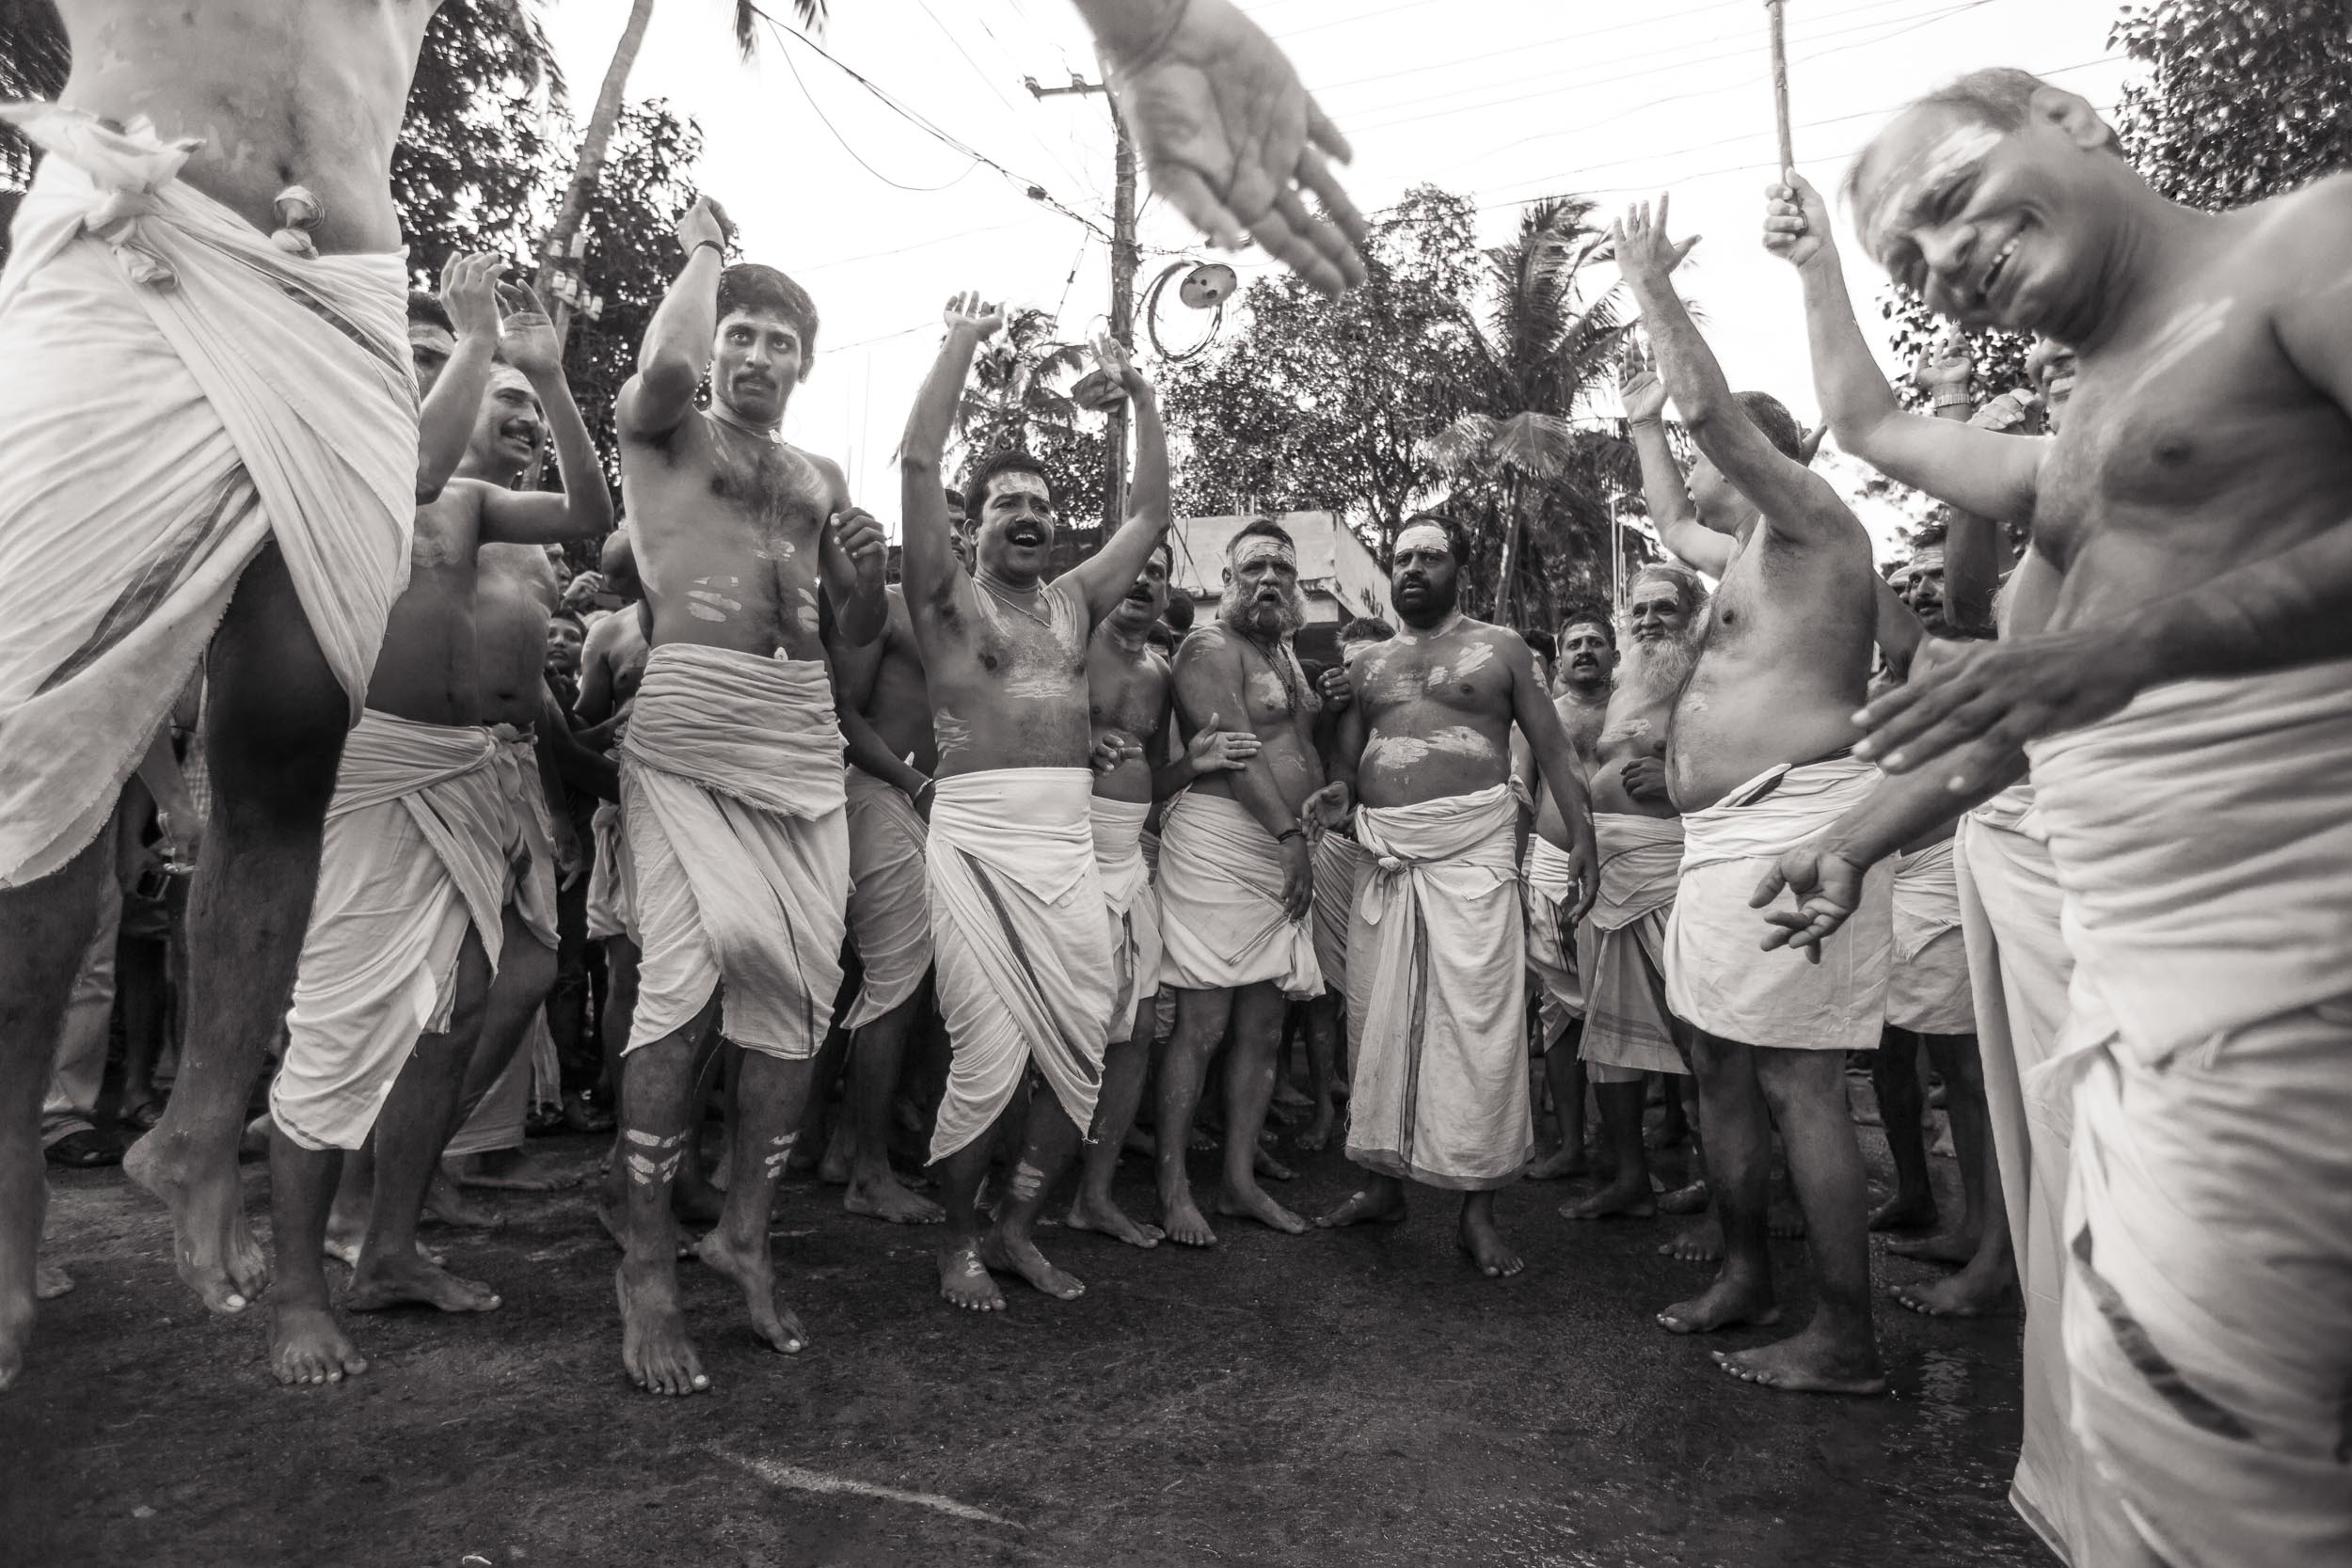 Sindhur_Photography_Travel_People_Kerala-25.JPG